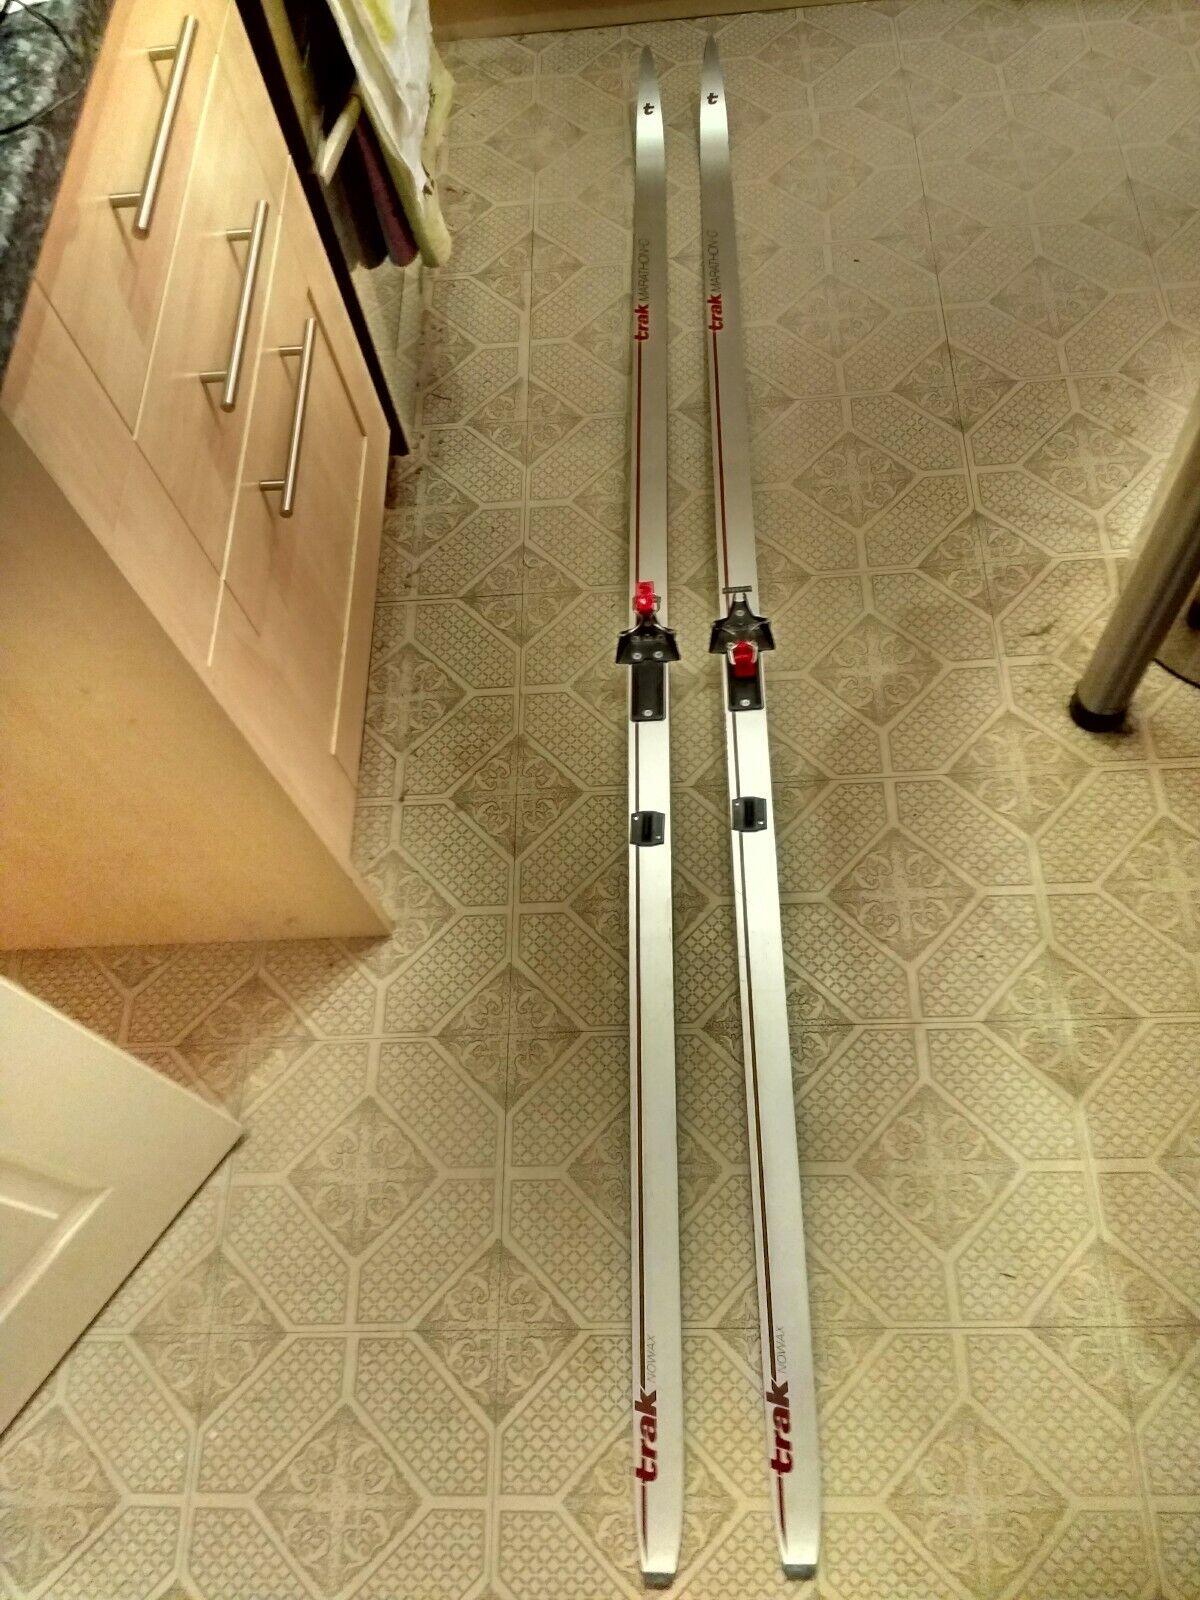 Trax NoWax Marathon-C cross country ski's, poles & bindings